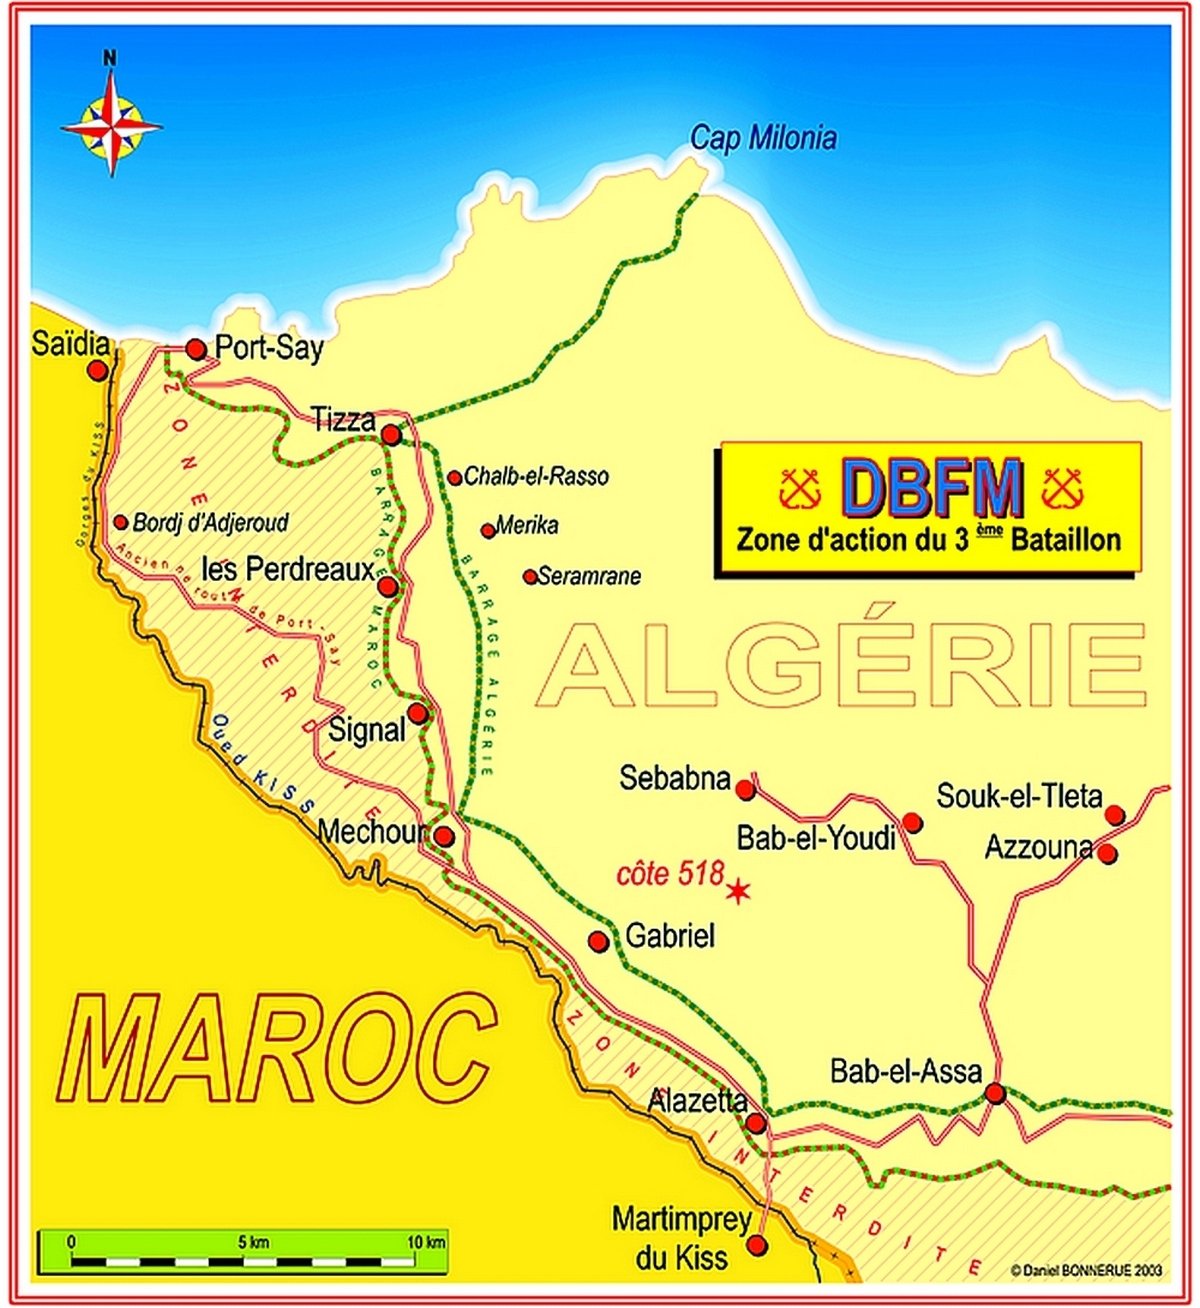 [Fusiliers Marins] DBFM 3EME BATAILLON - Page 4 Carte_12